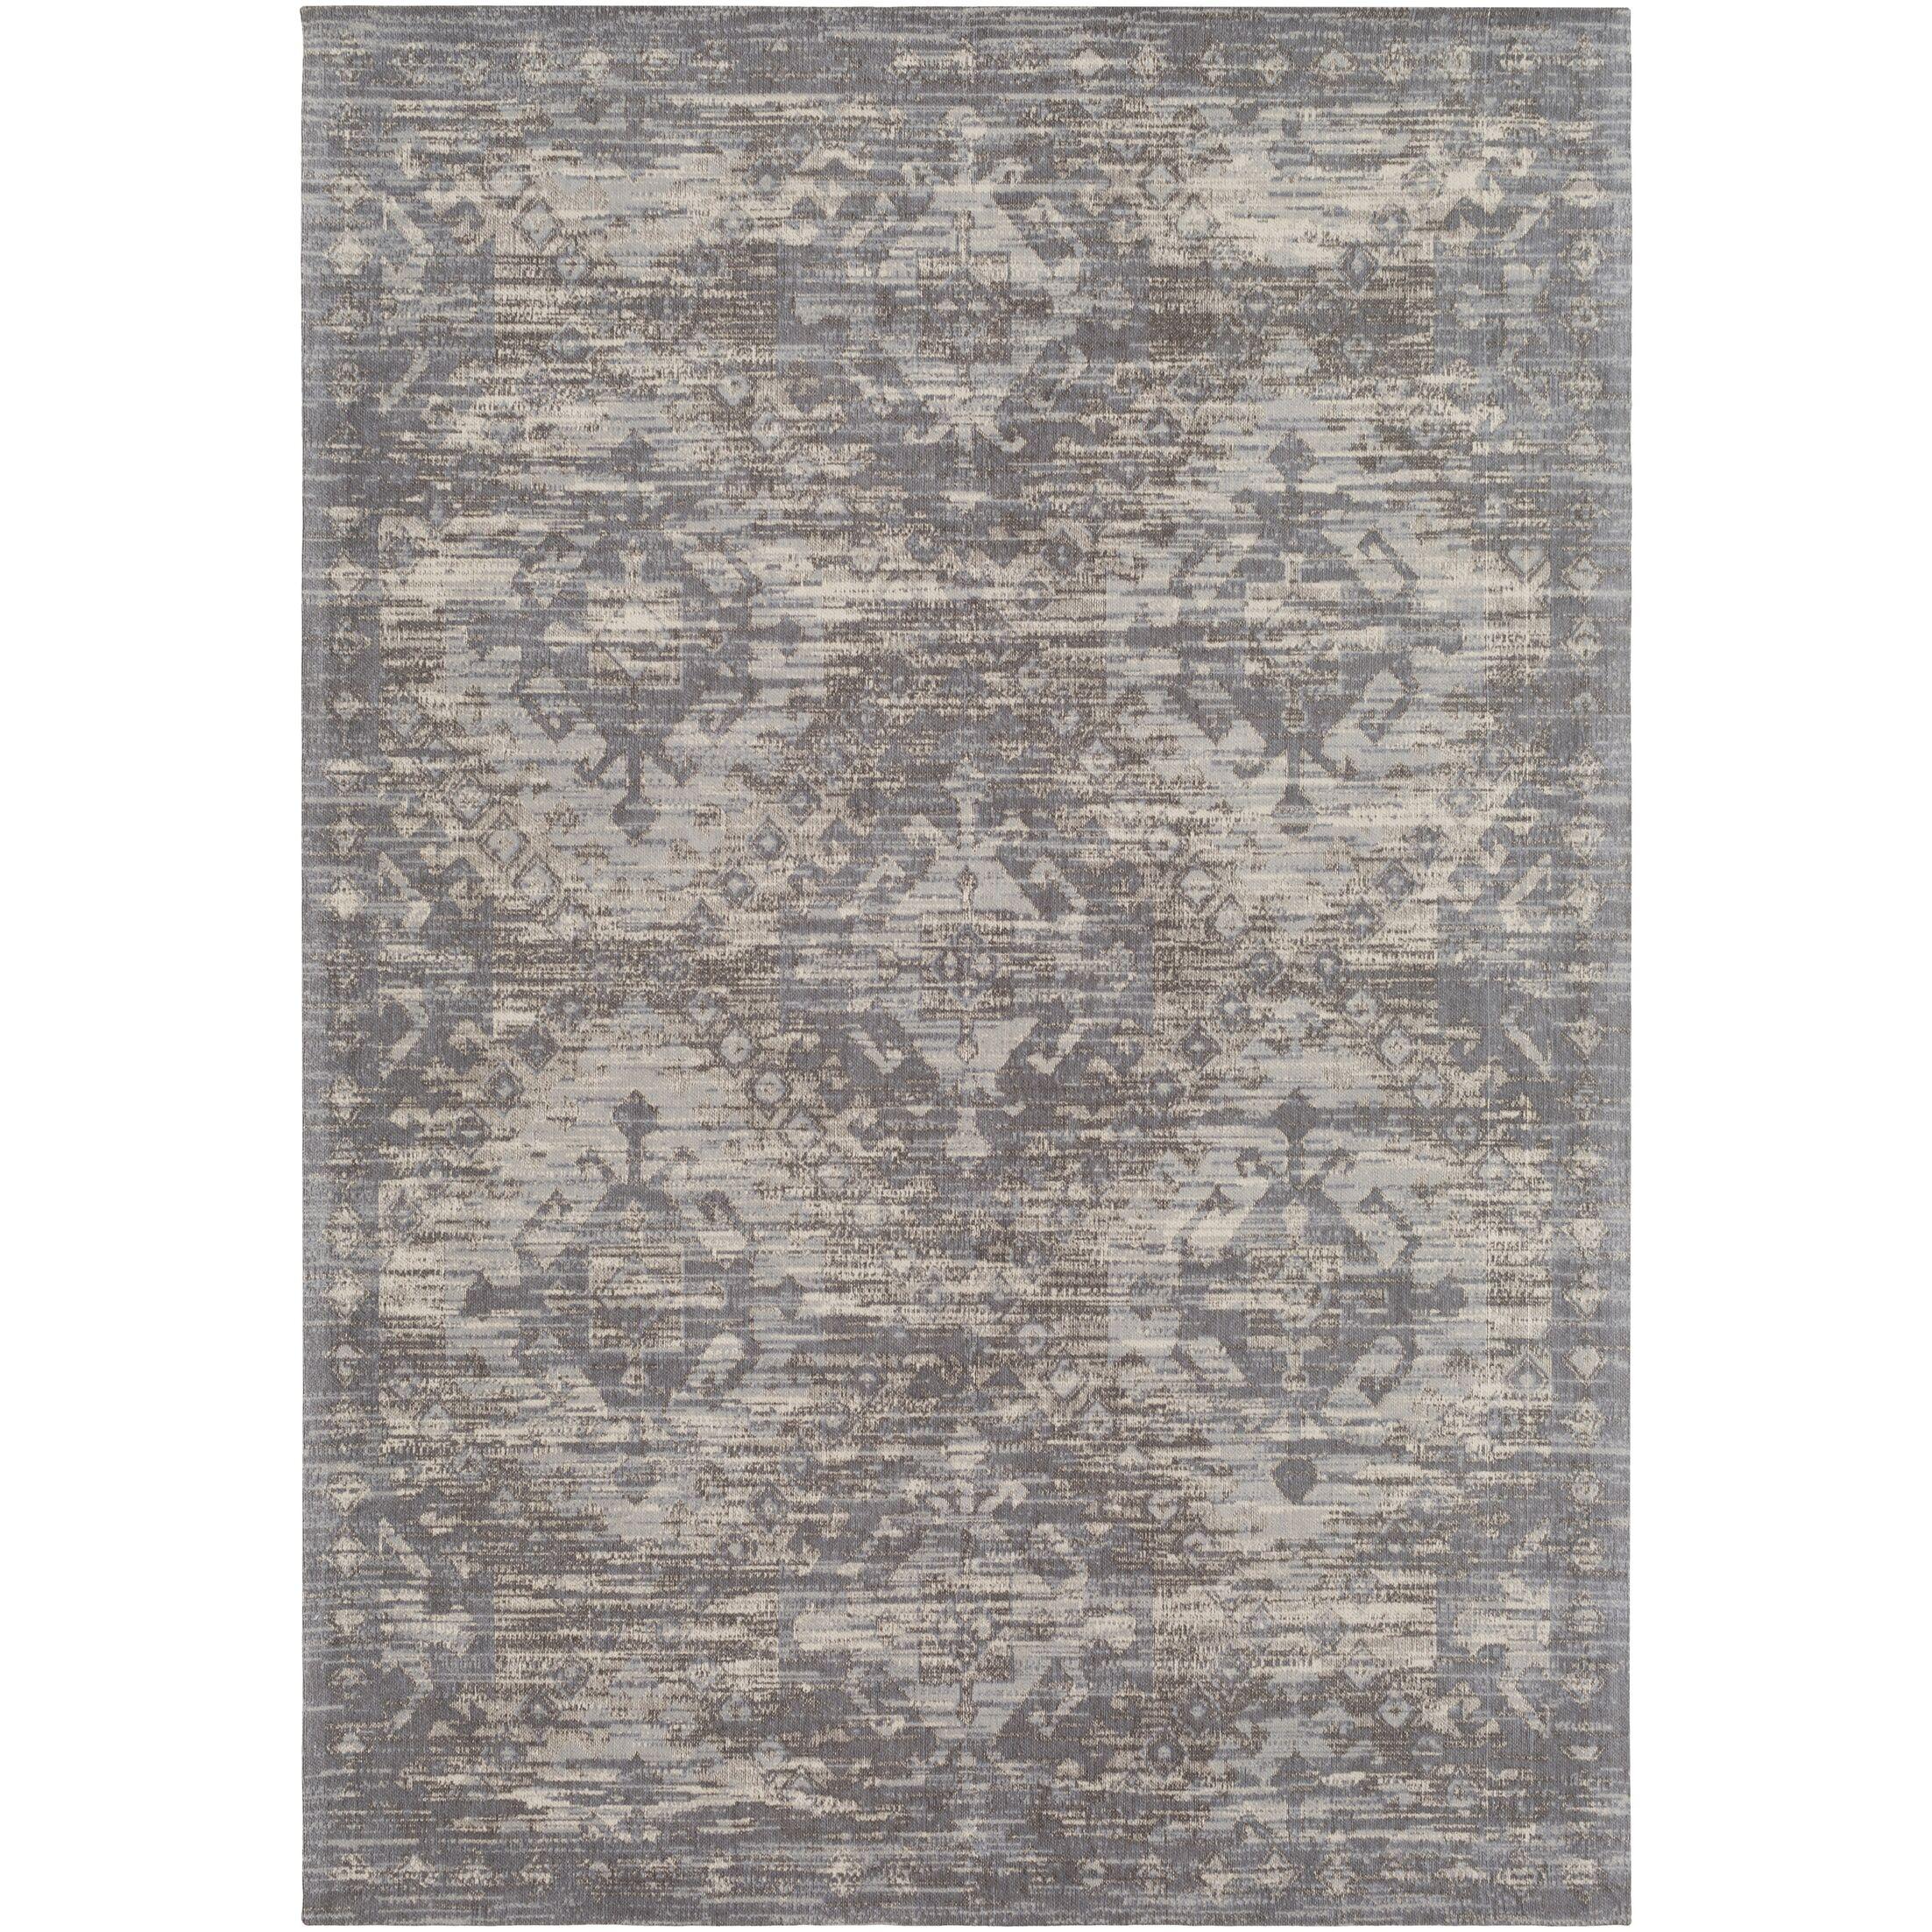 Hamza Hand-Woven Medium Gray/Beige Area Rug Rug Size: Rectangle 5' x 7'6